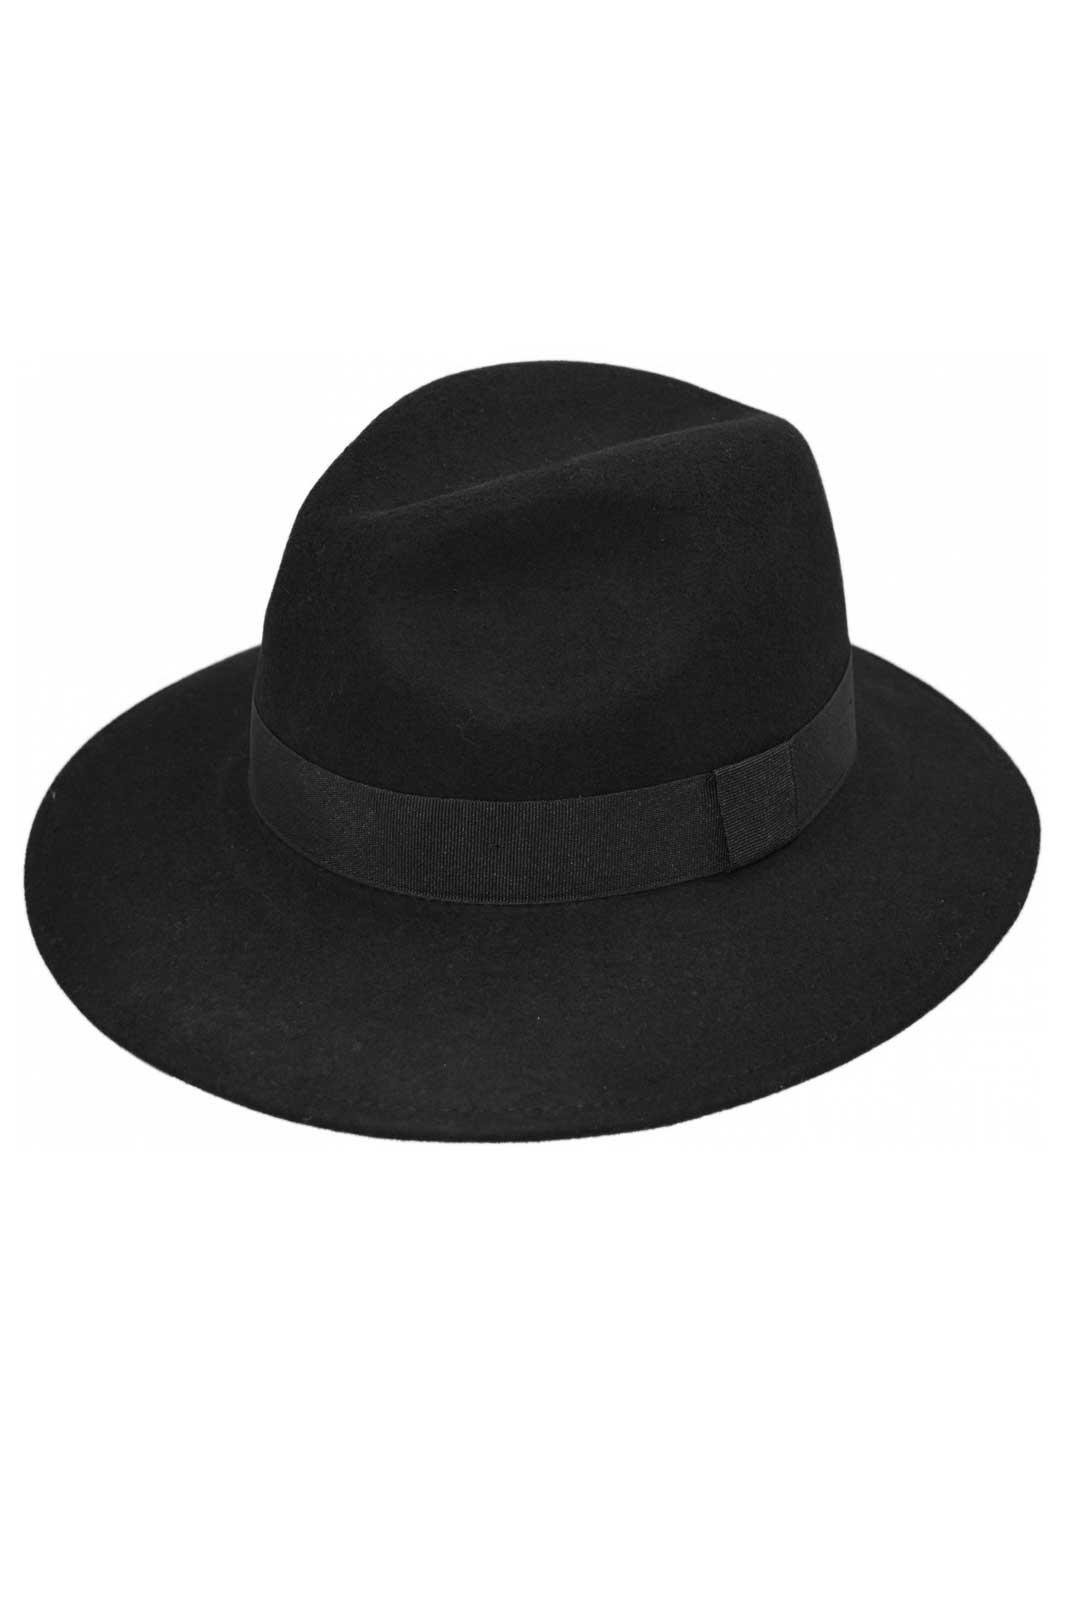 Wool Felt Fedora Hat Black